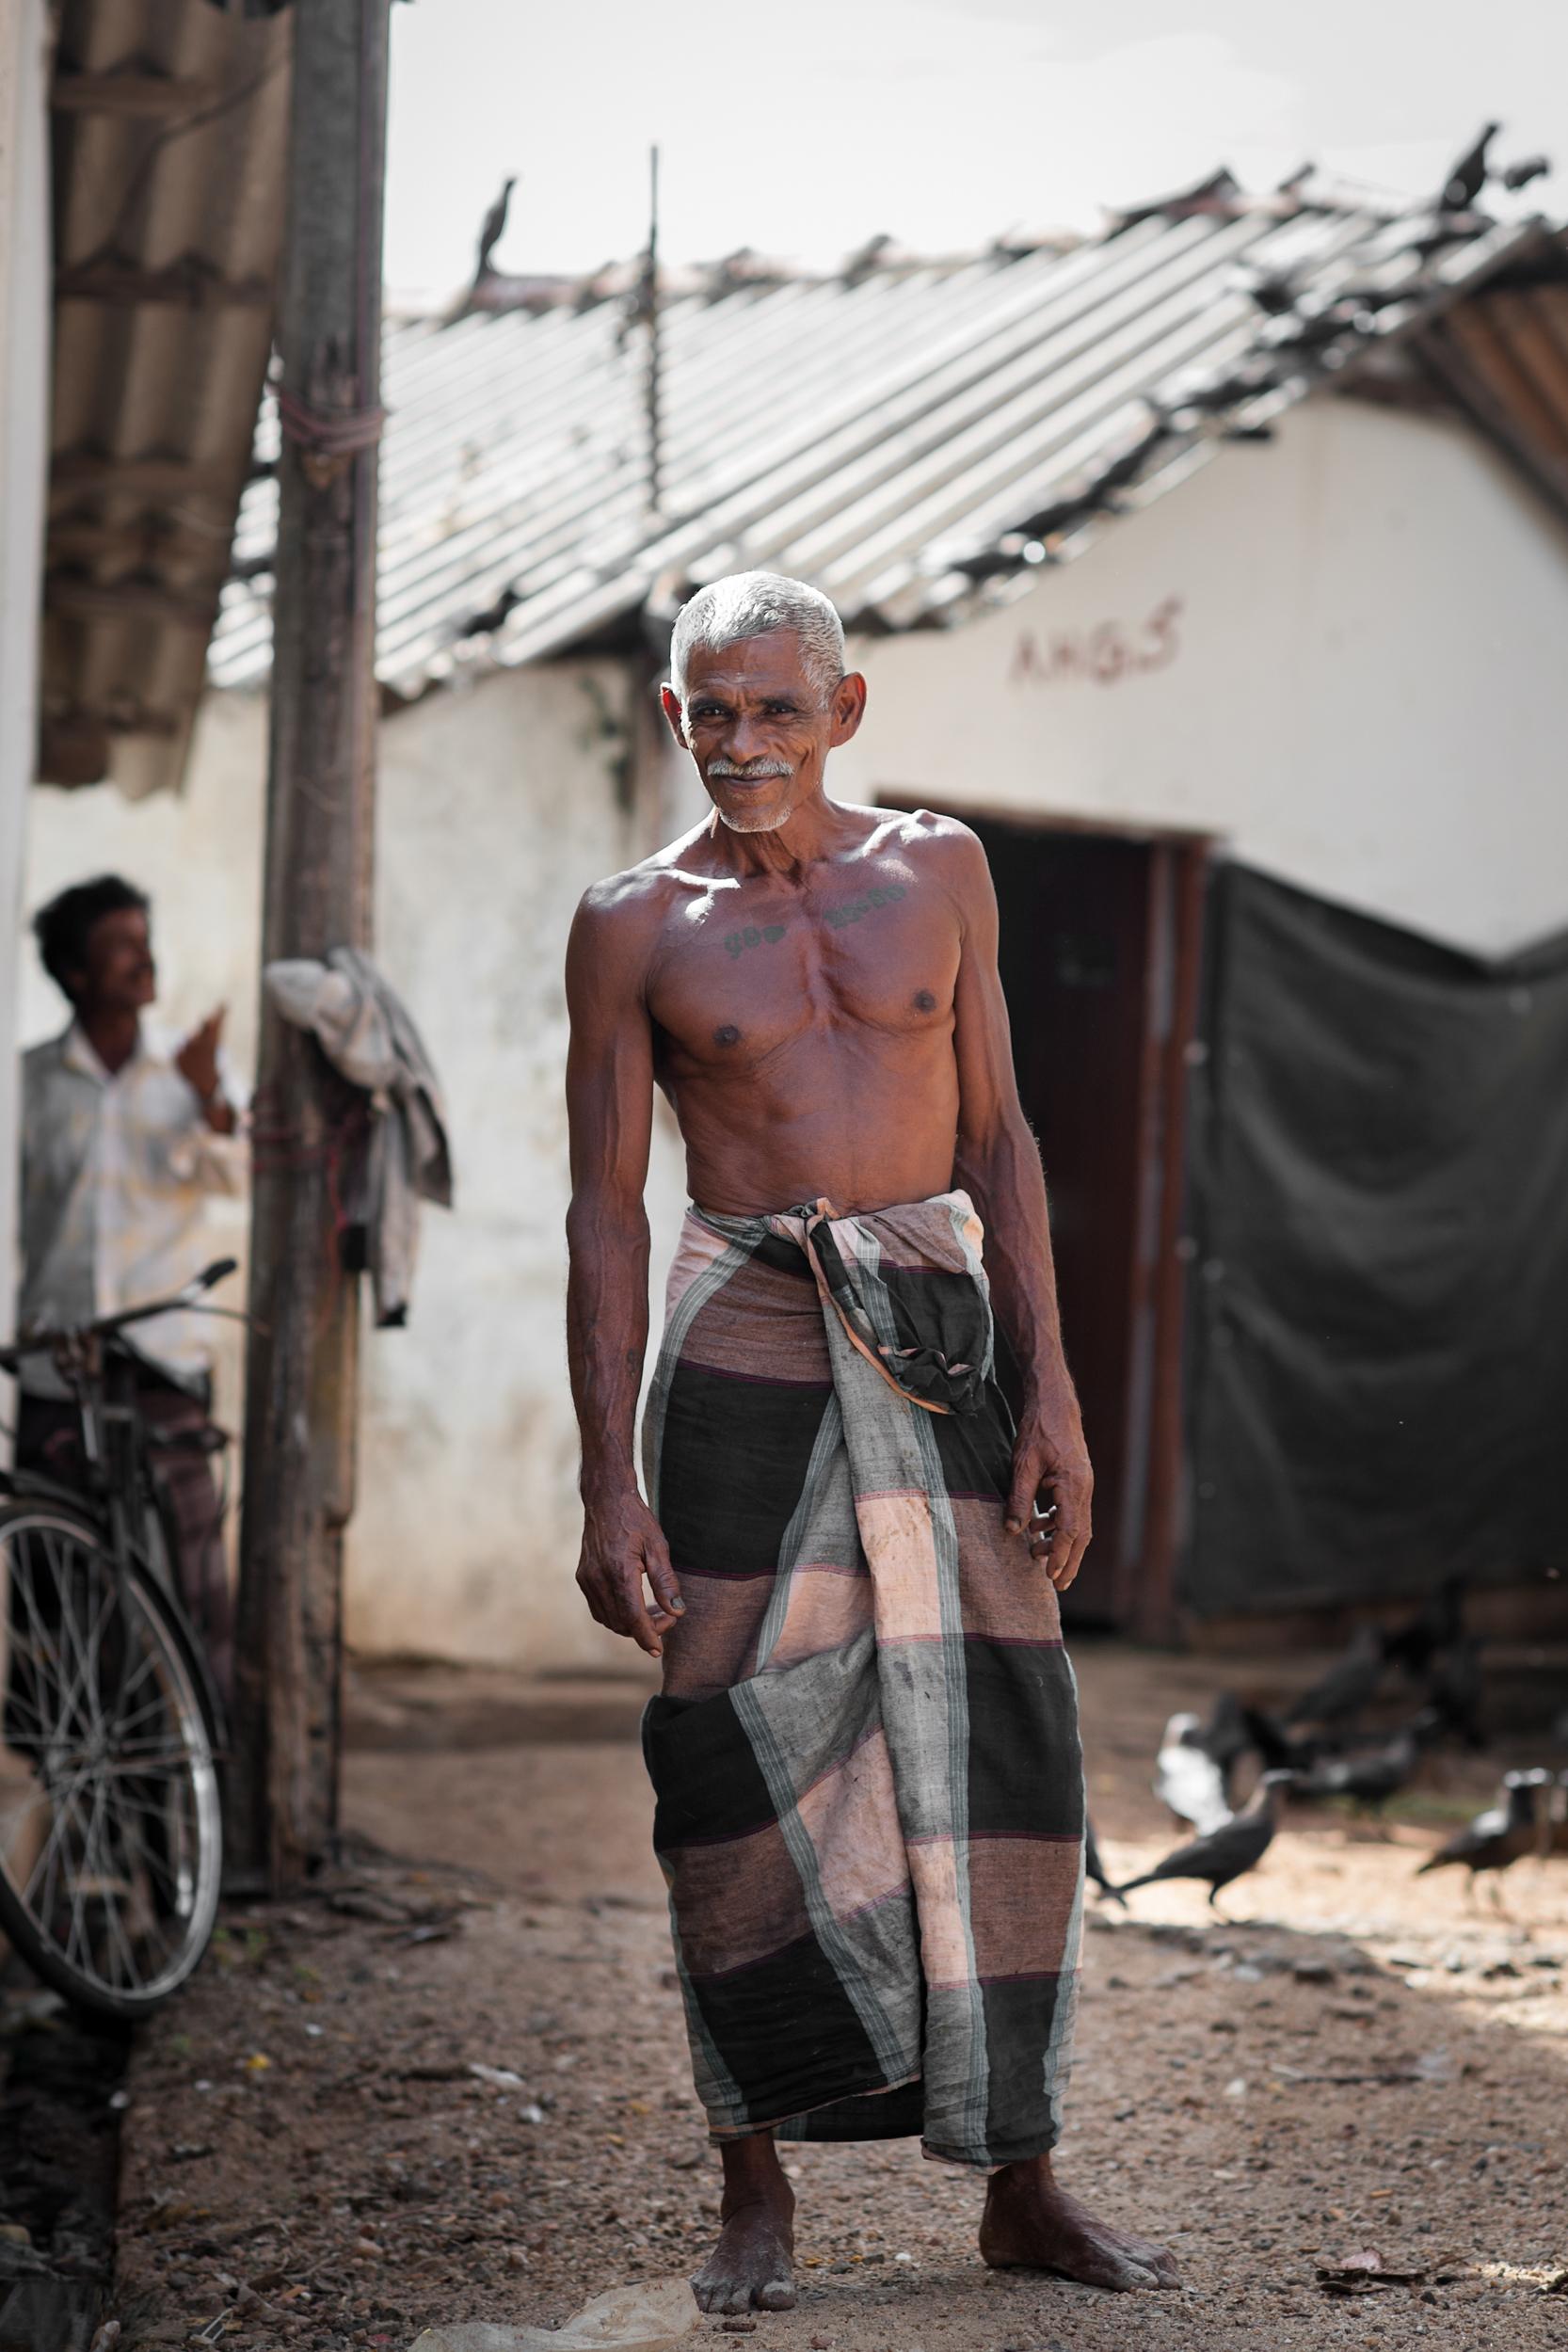 Labourer, Trincomalee